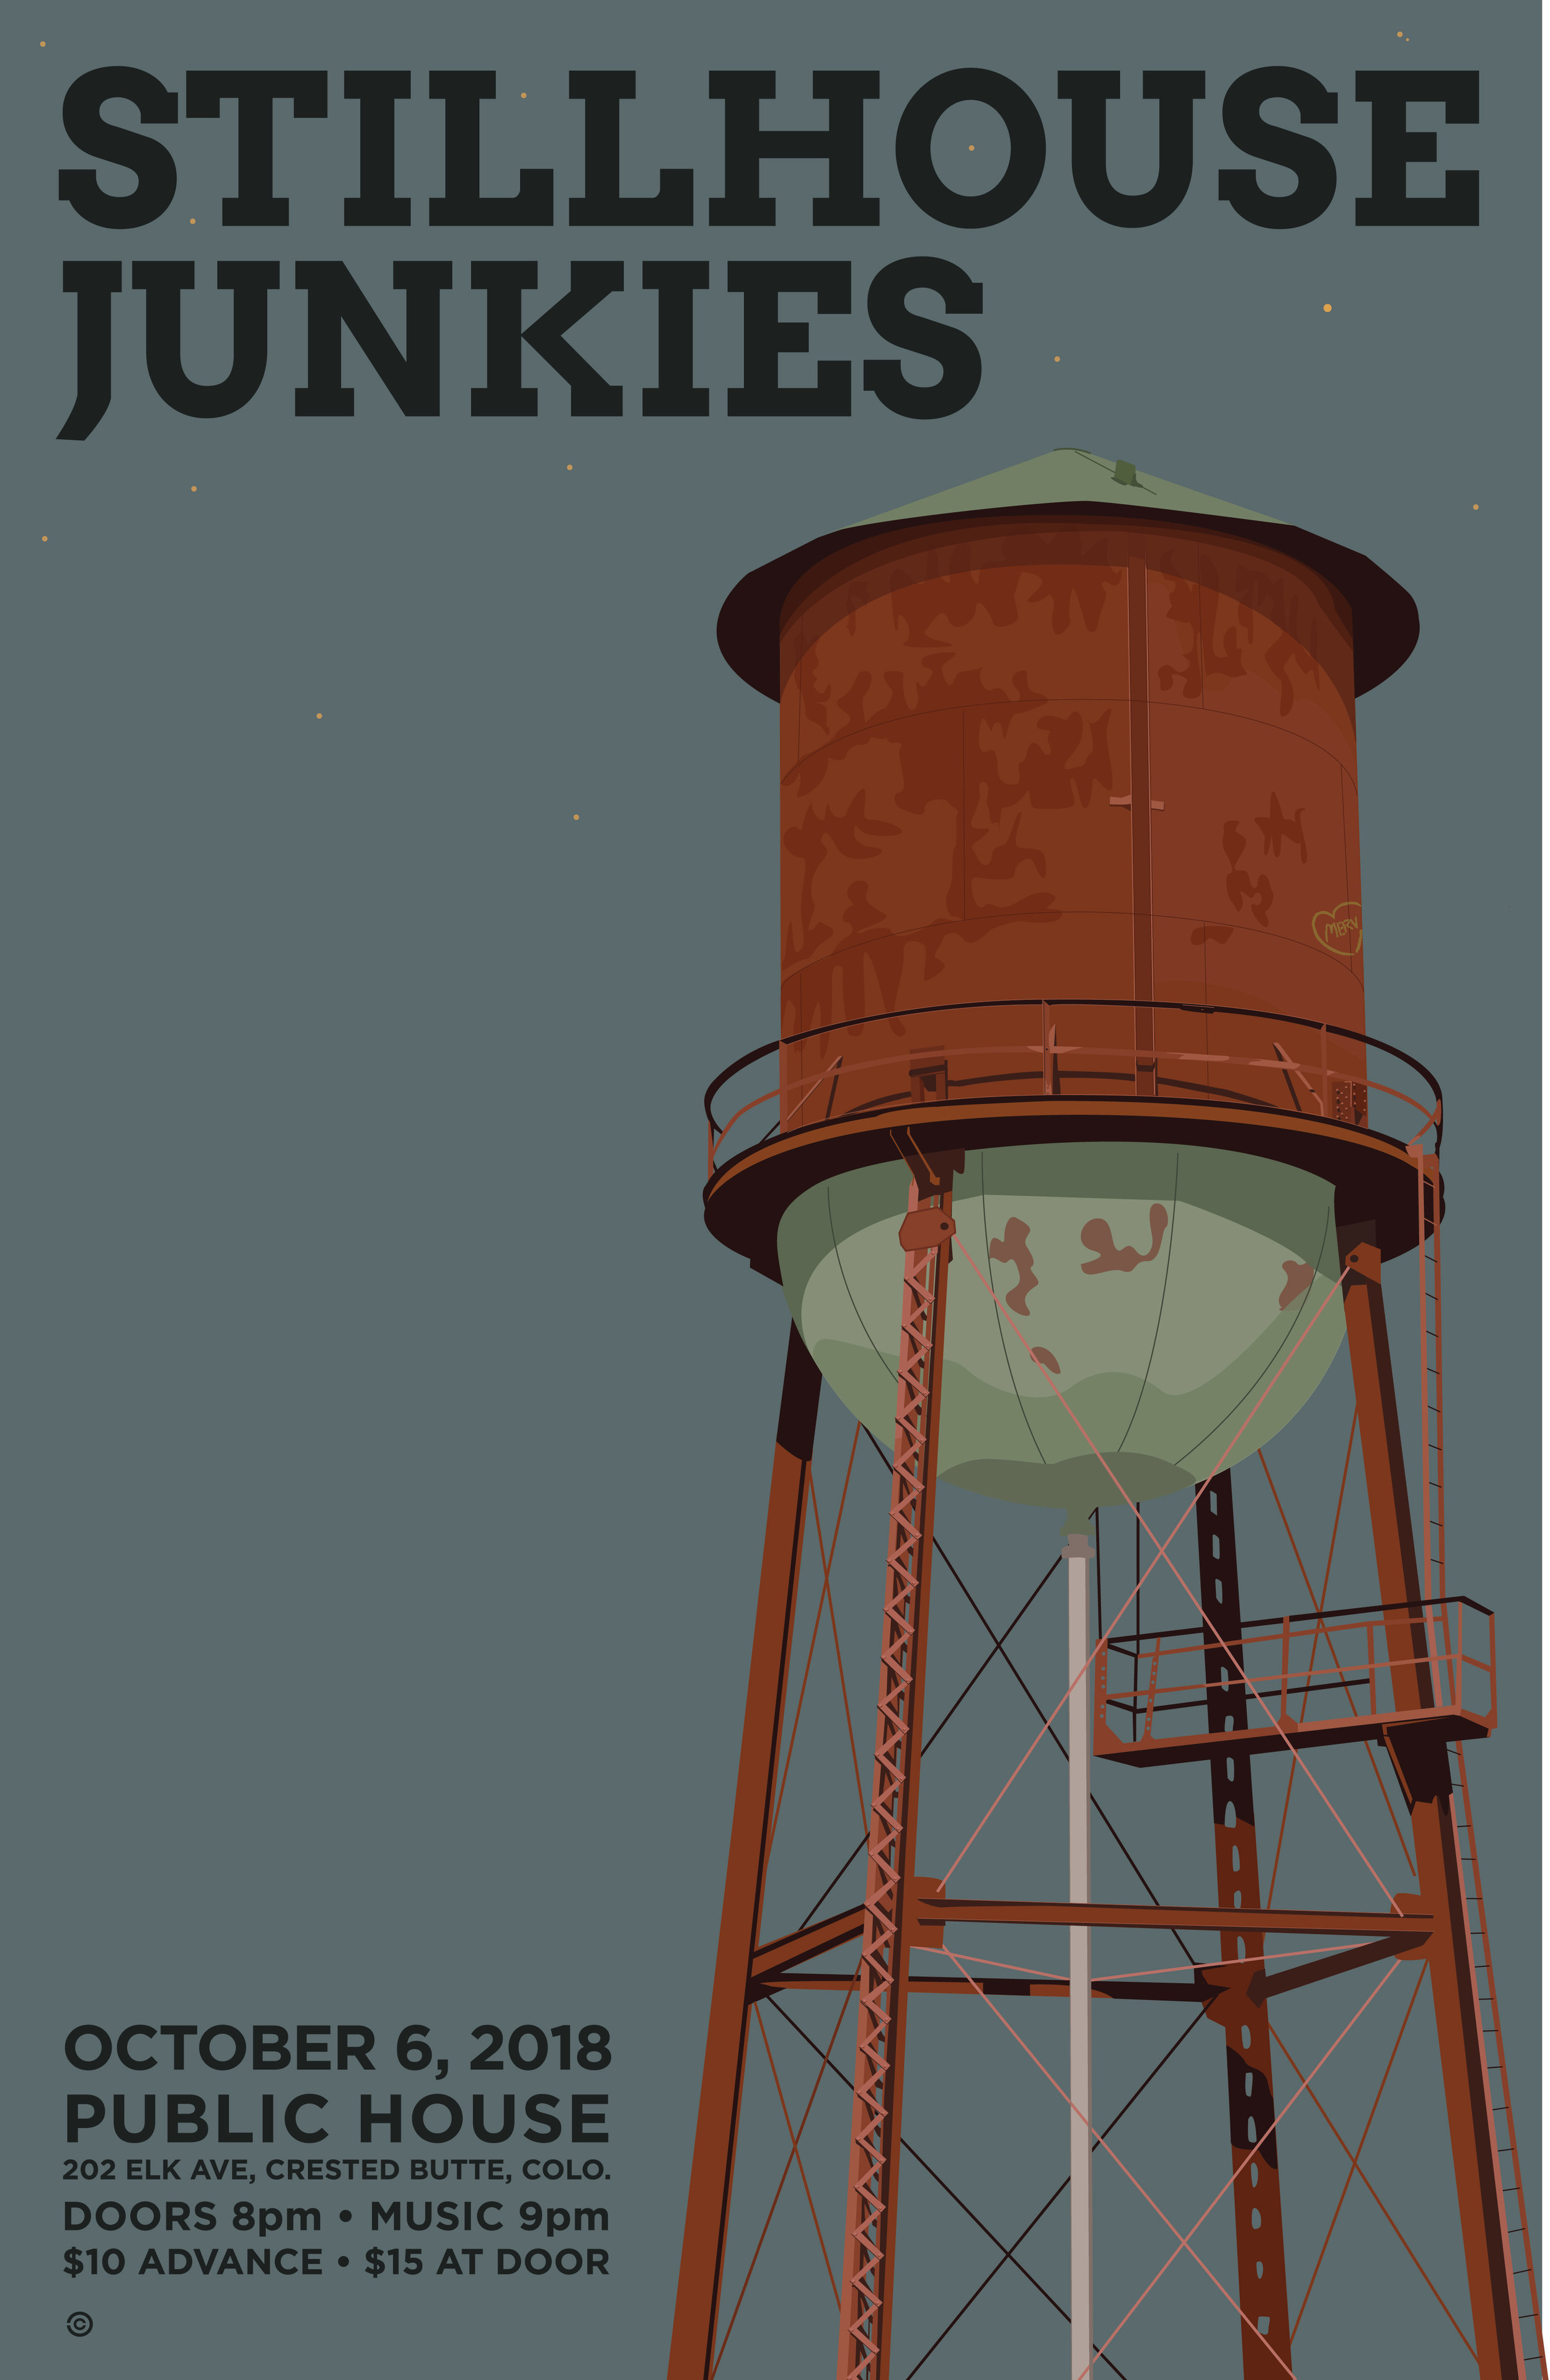 Watertower - Stillhouse Junkies